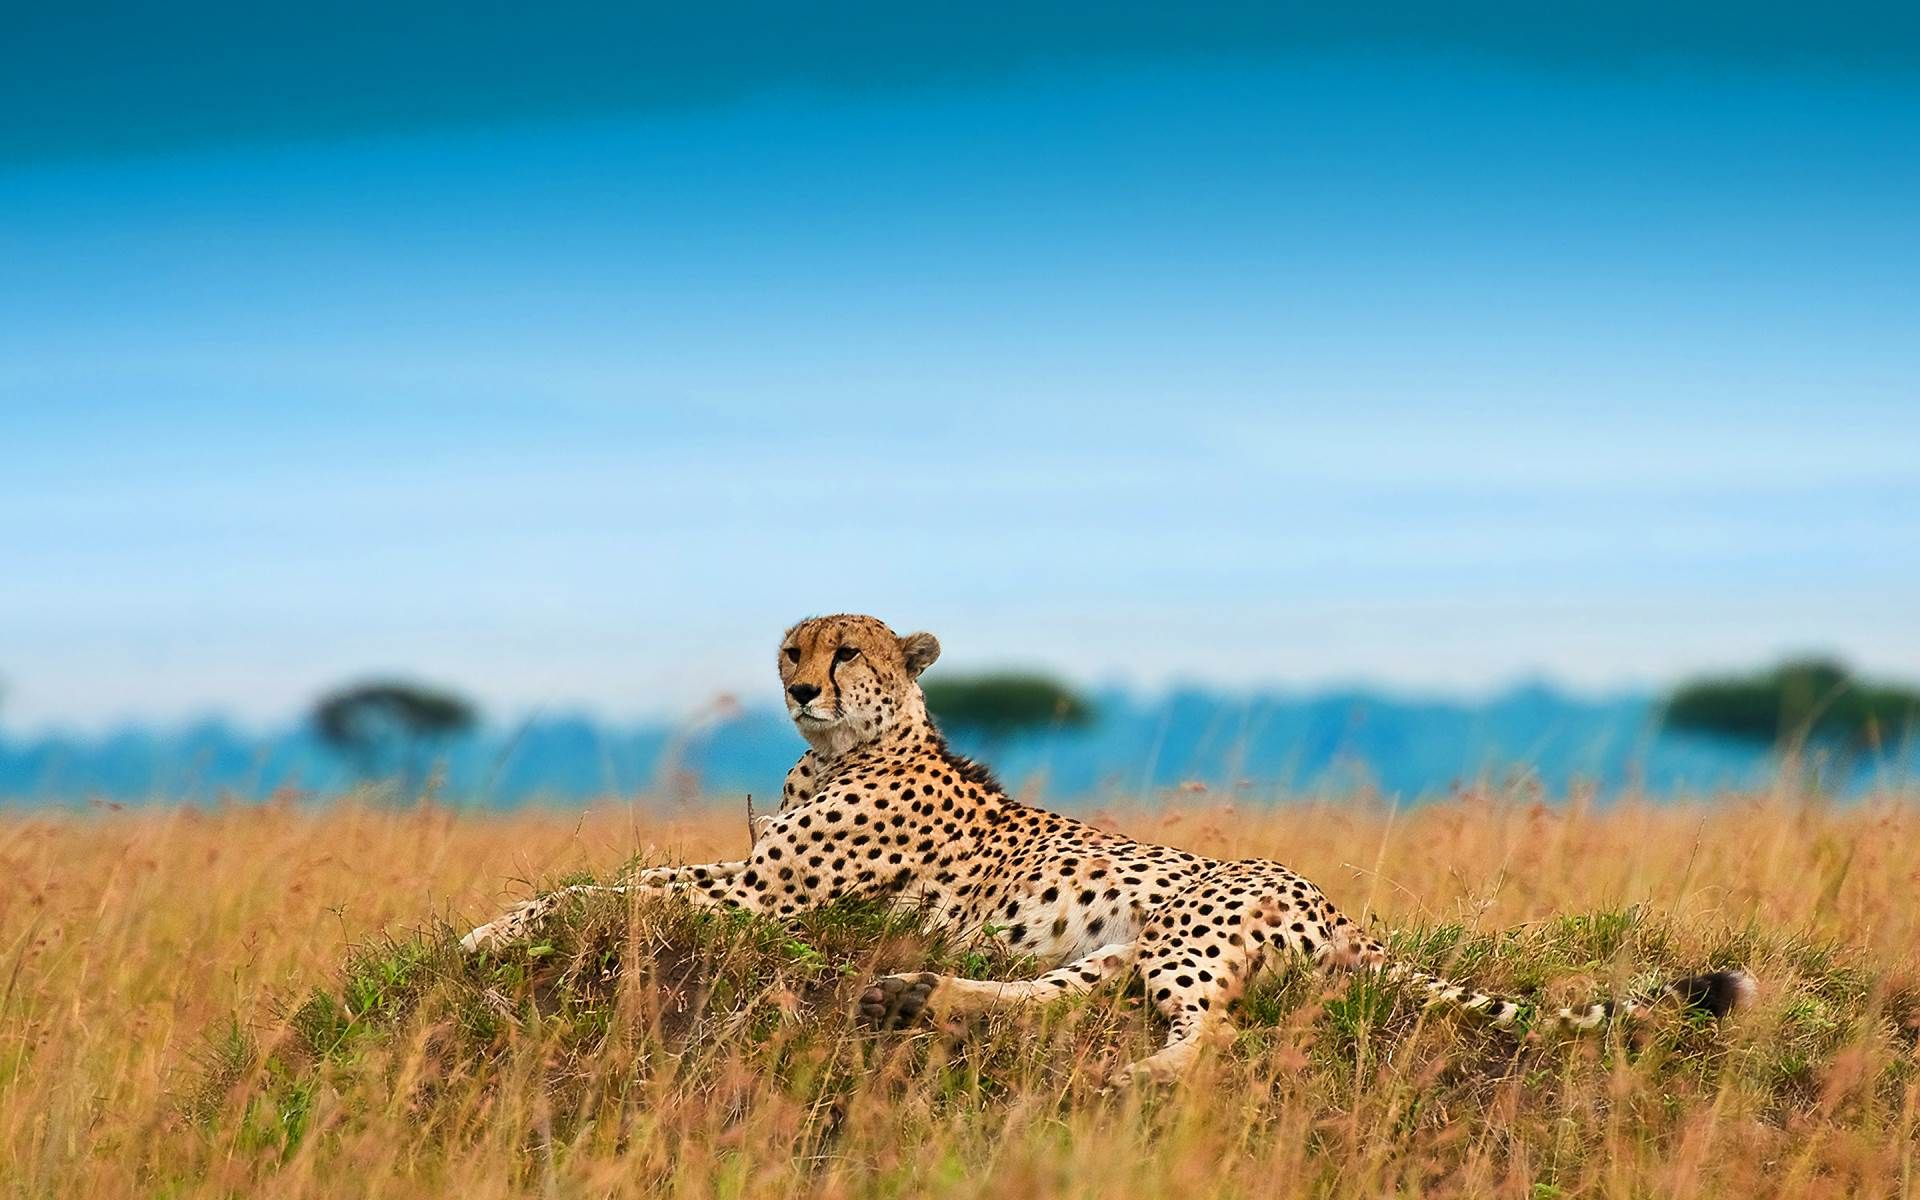 Cheetah video running wallpapers keyword 16001200 cheetah pictures cheetah video running wallpapers keyword 16001200 cheetah pictures adorable wallpapers voltagebd Image collections